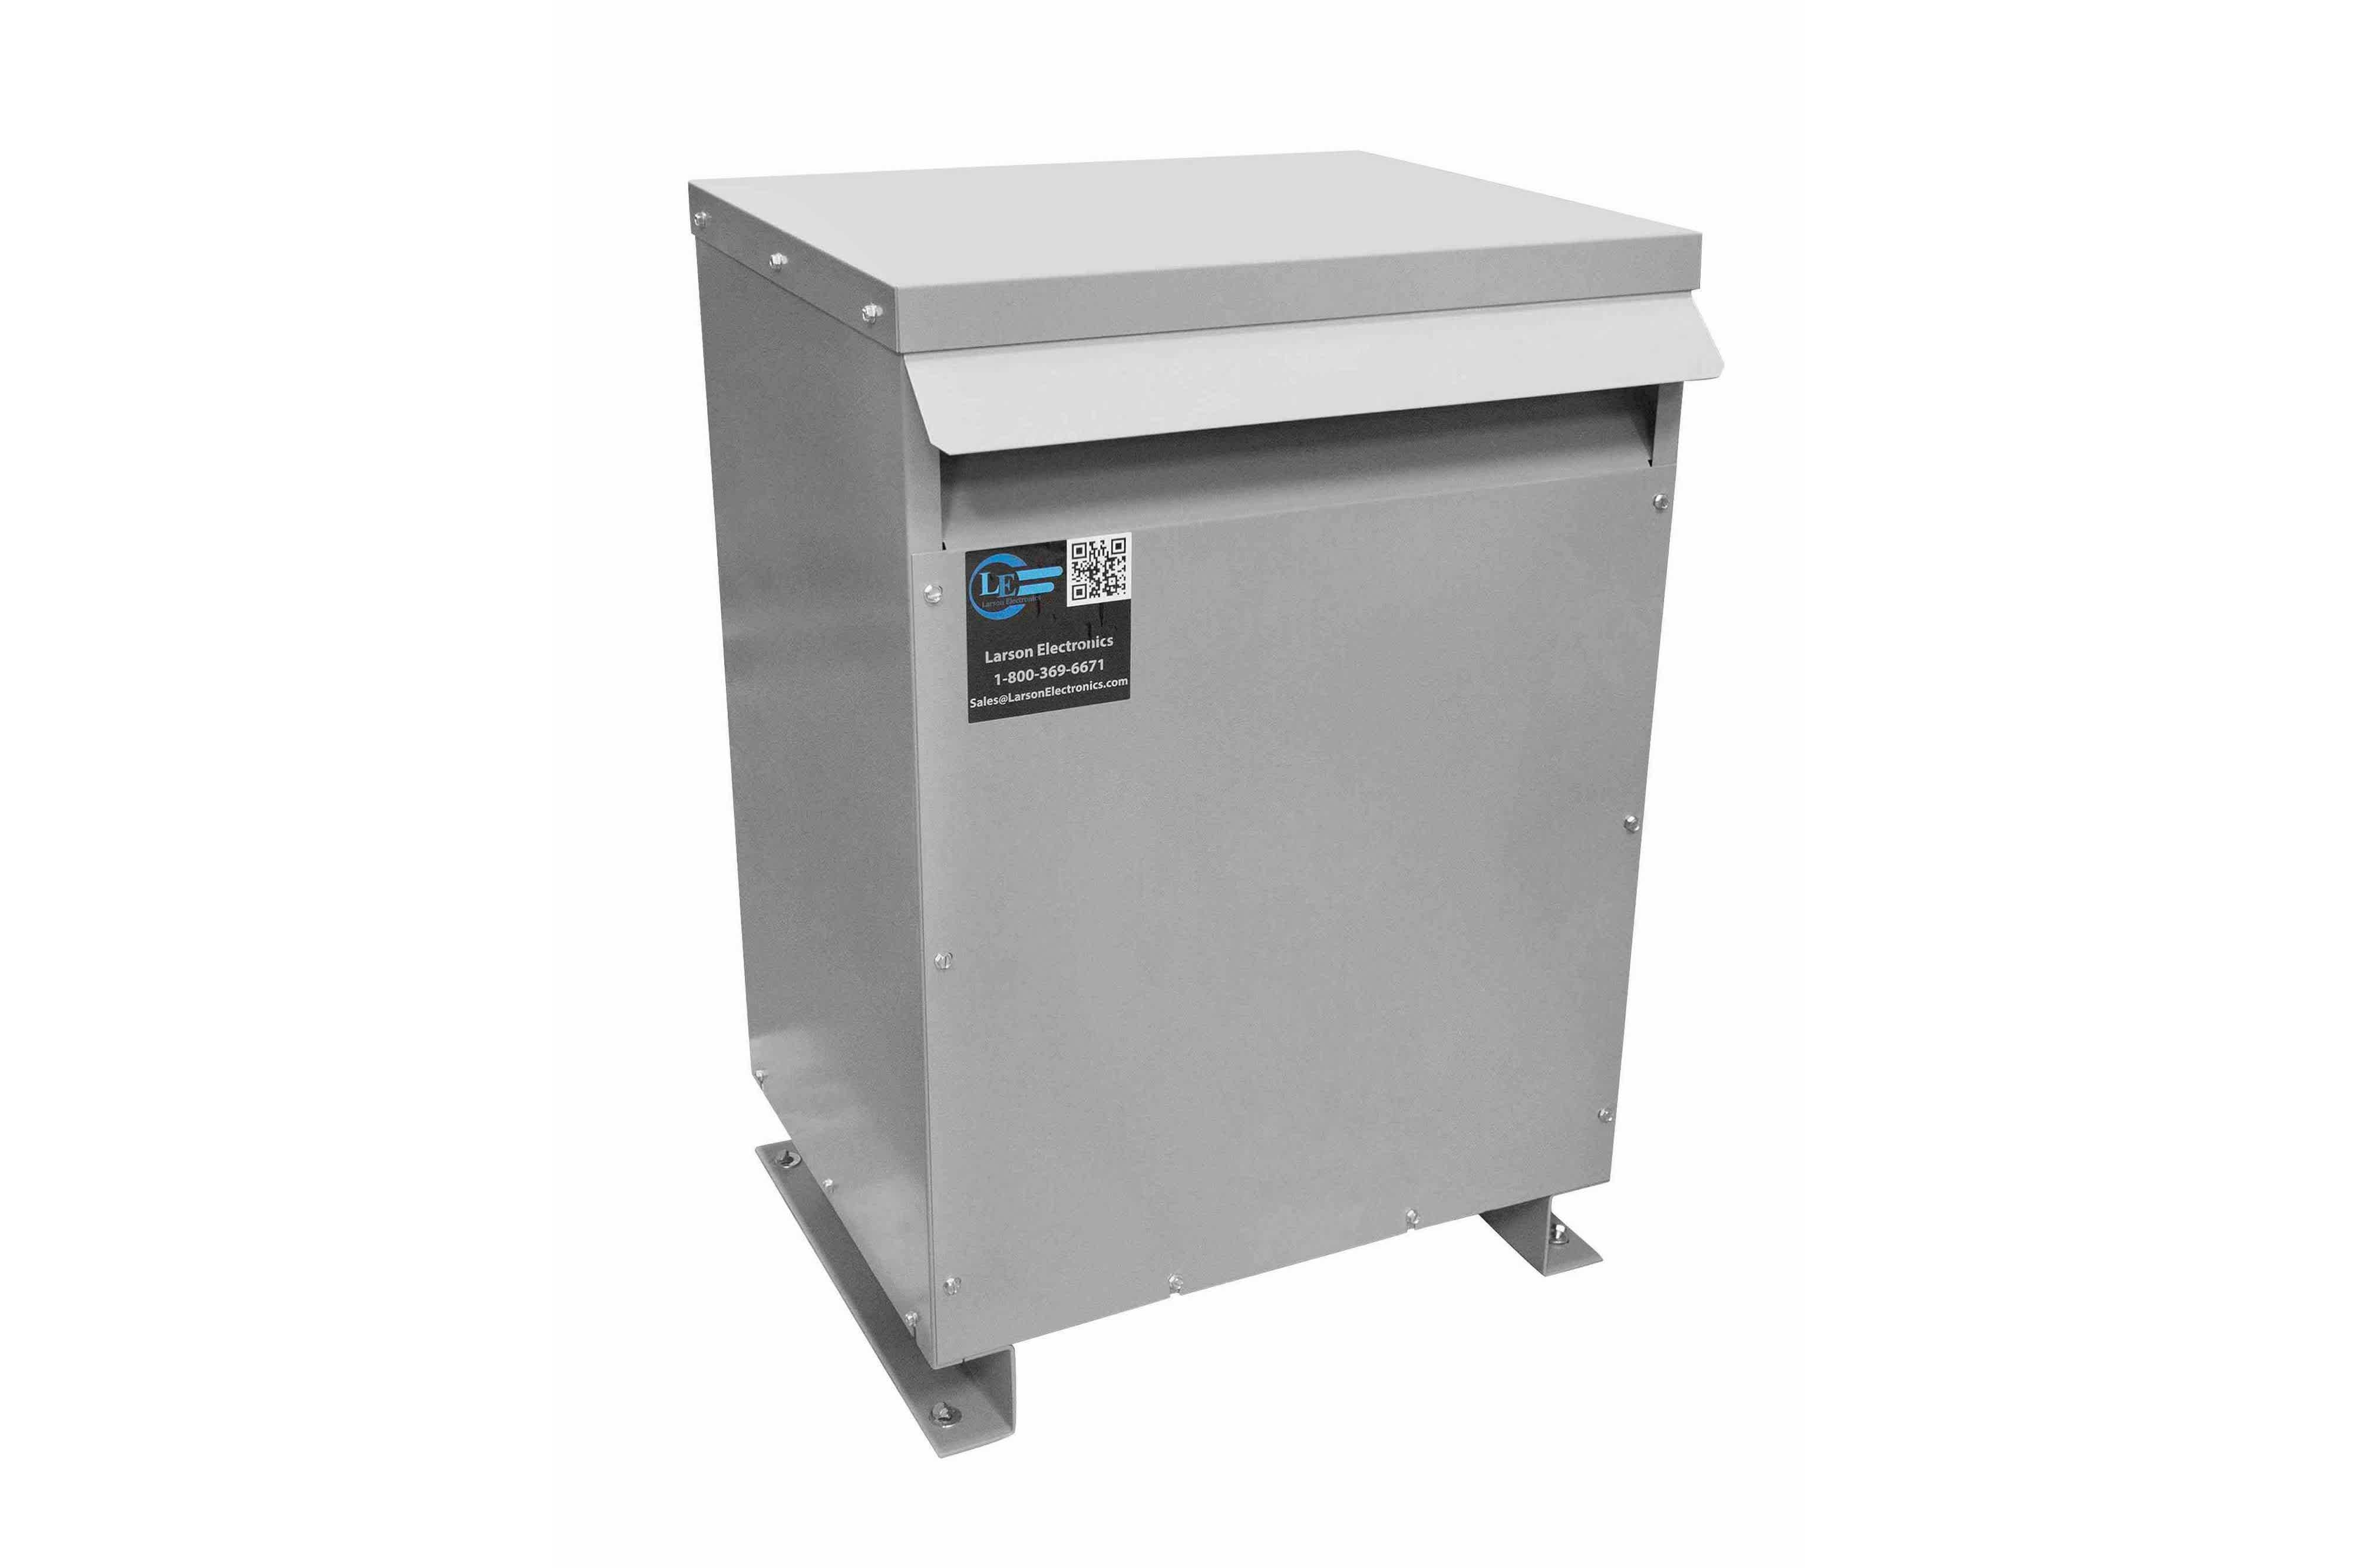 15 kVA 3PH Isolation Transformer, 220V Wye Primary, 208Y/120 Wye-N Secondary, N3R, Ventilated, 60 Hz